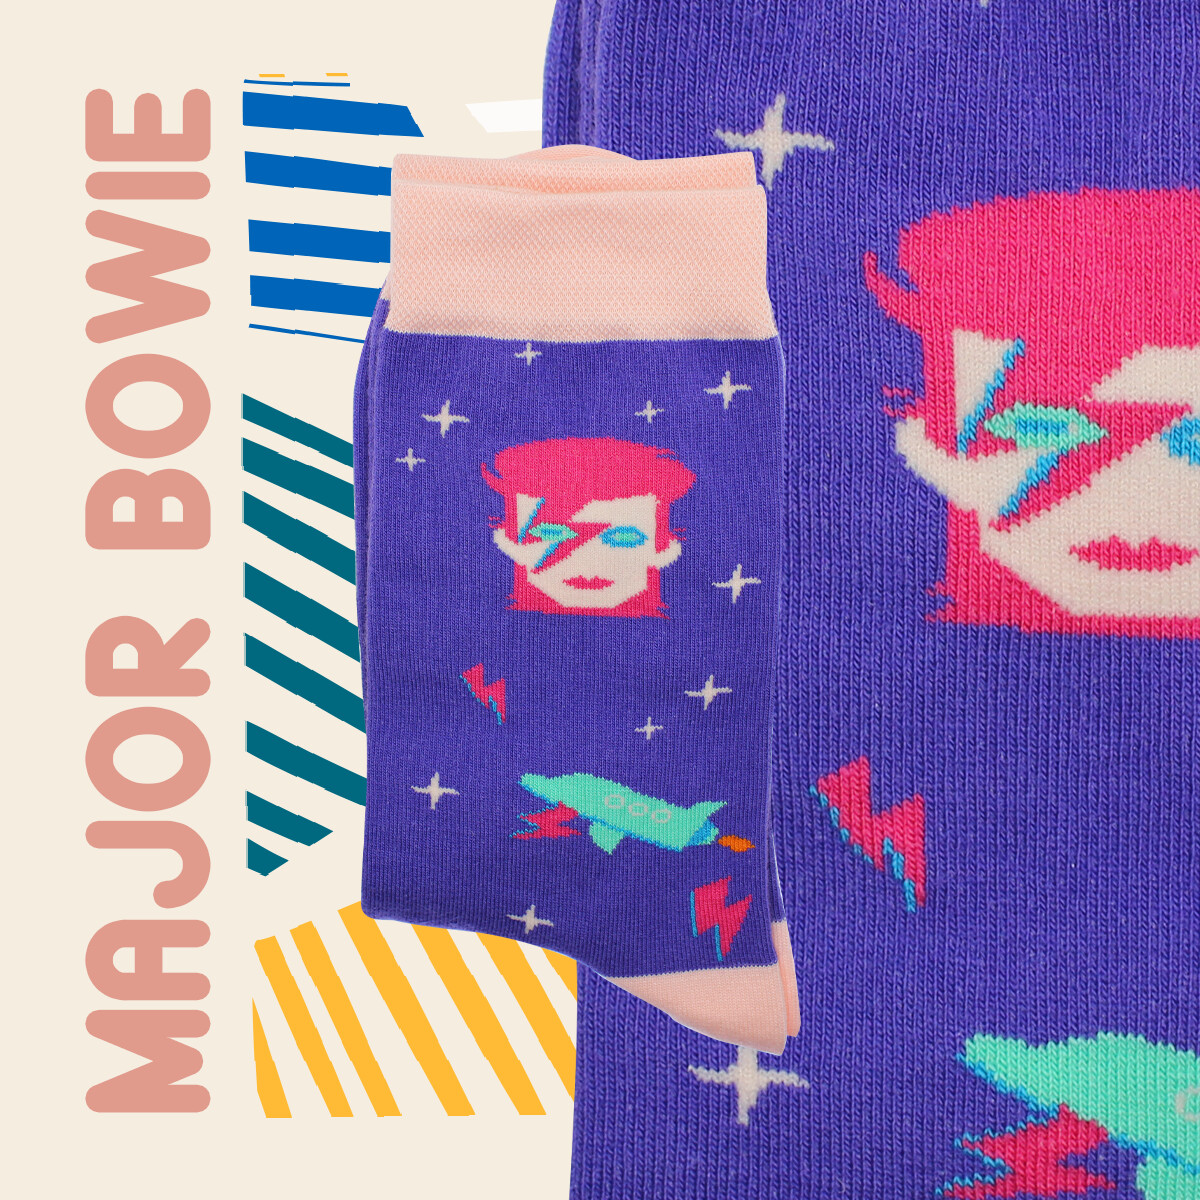 David Bowie-ის წინდები